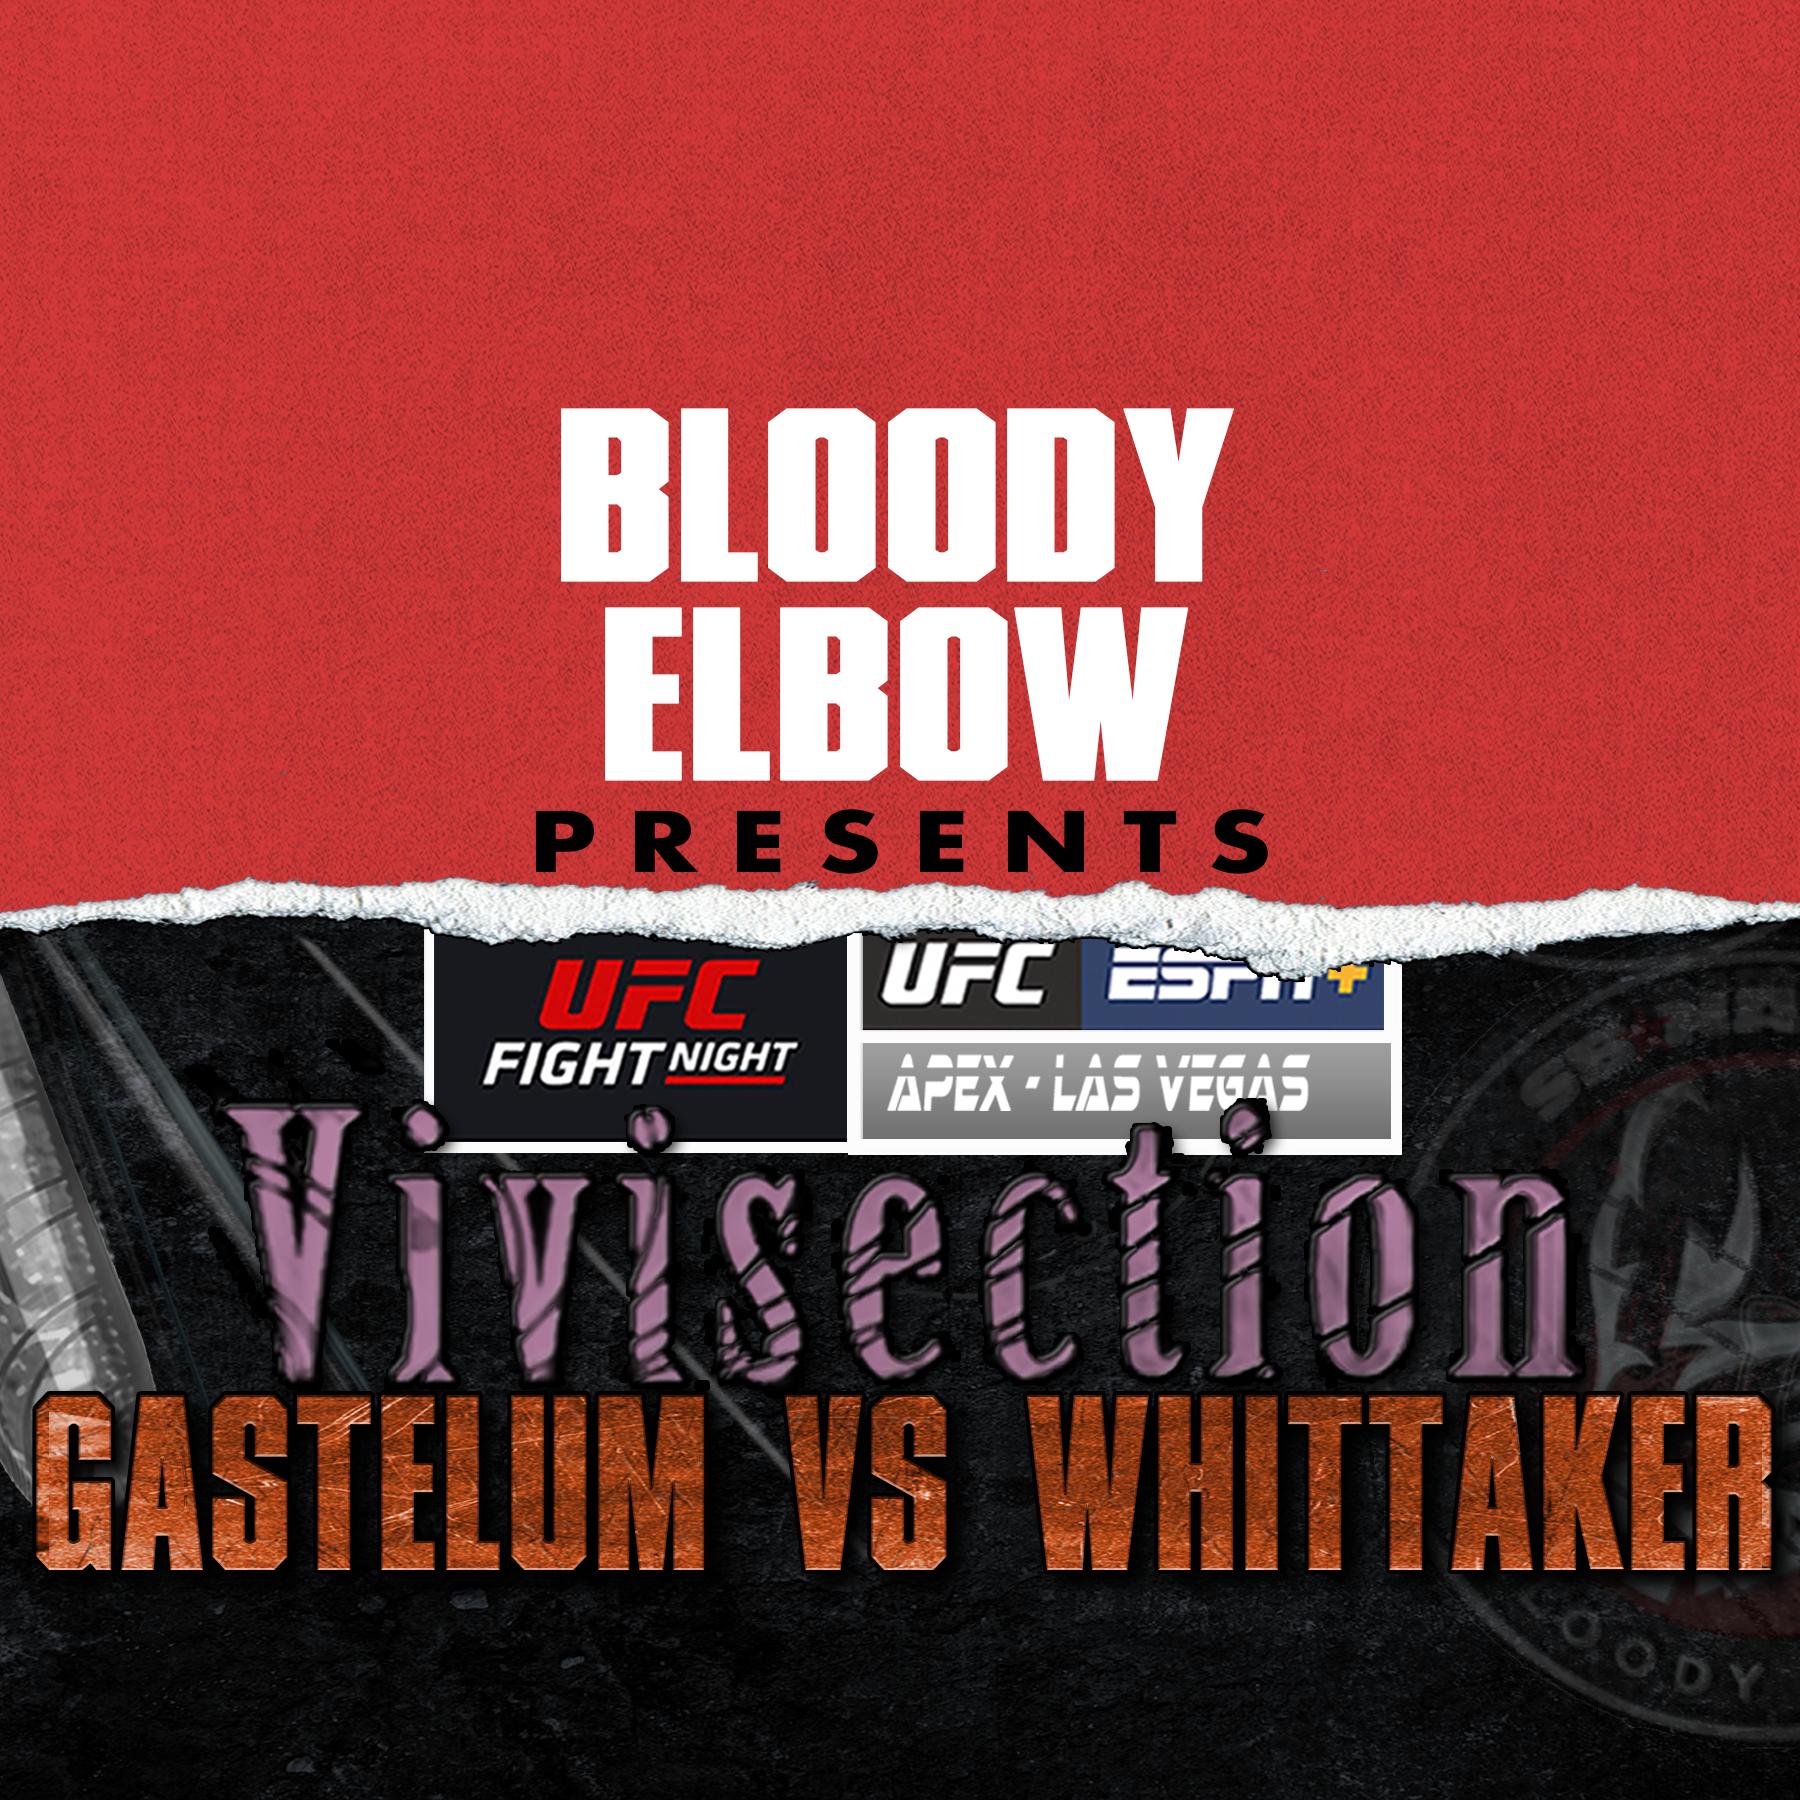 MMA VIVI, THE MMA VIVISECTION, UFC VEGAS 24, WHITTAKER VS GASTELUM, UFC PREVIEW, UFC PICKS & PREDICTIONS, UFC ODDS, UFC ANALYSIS,